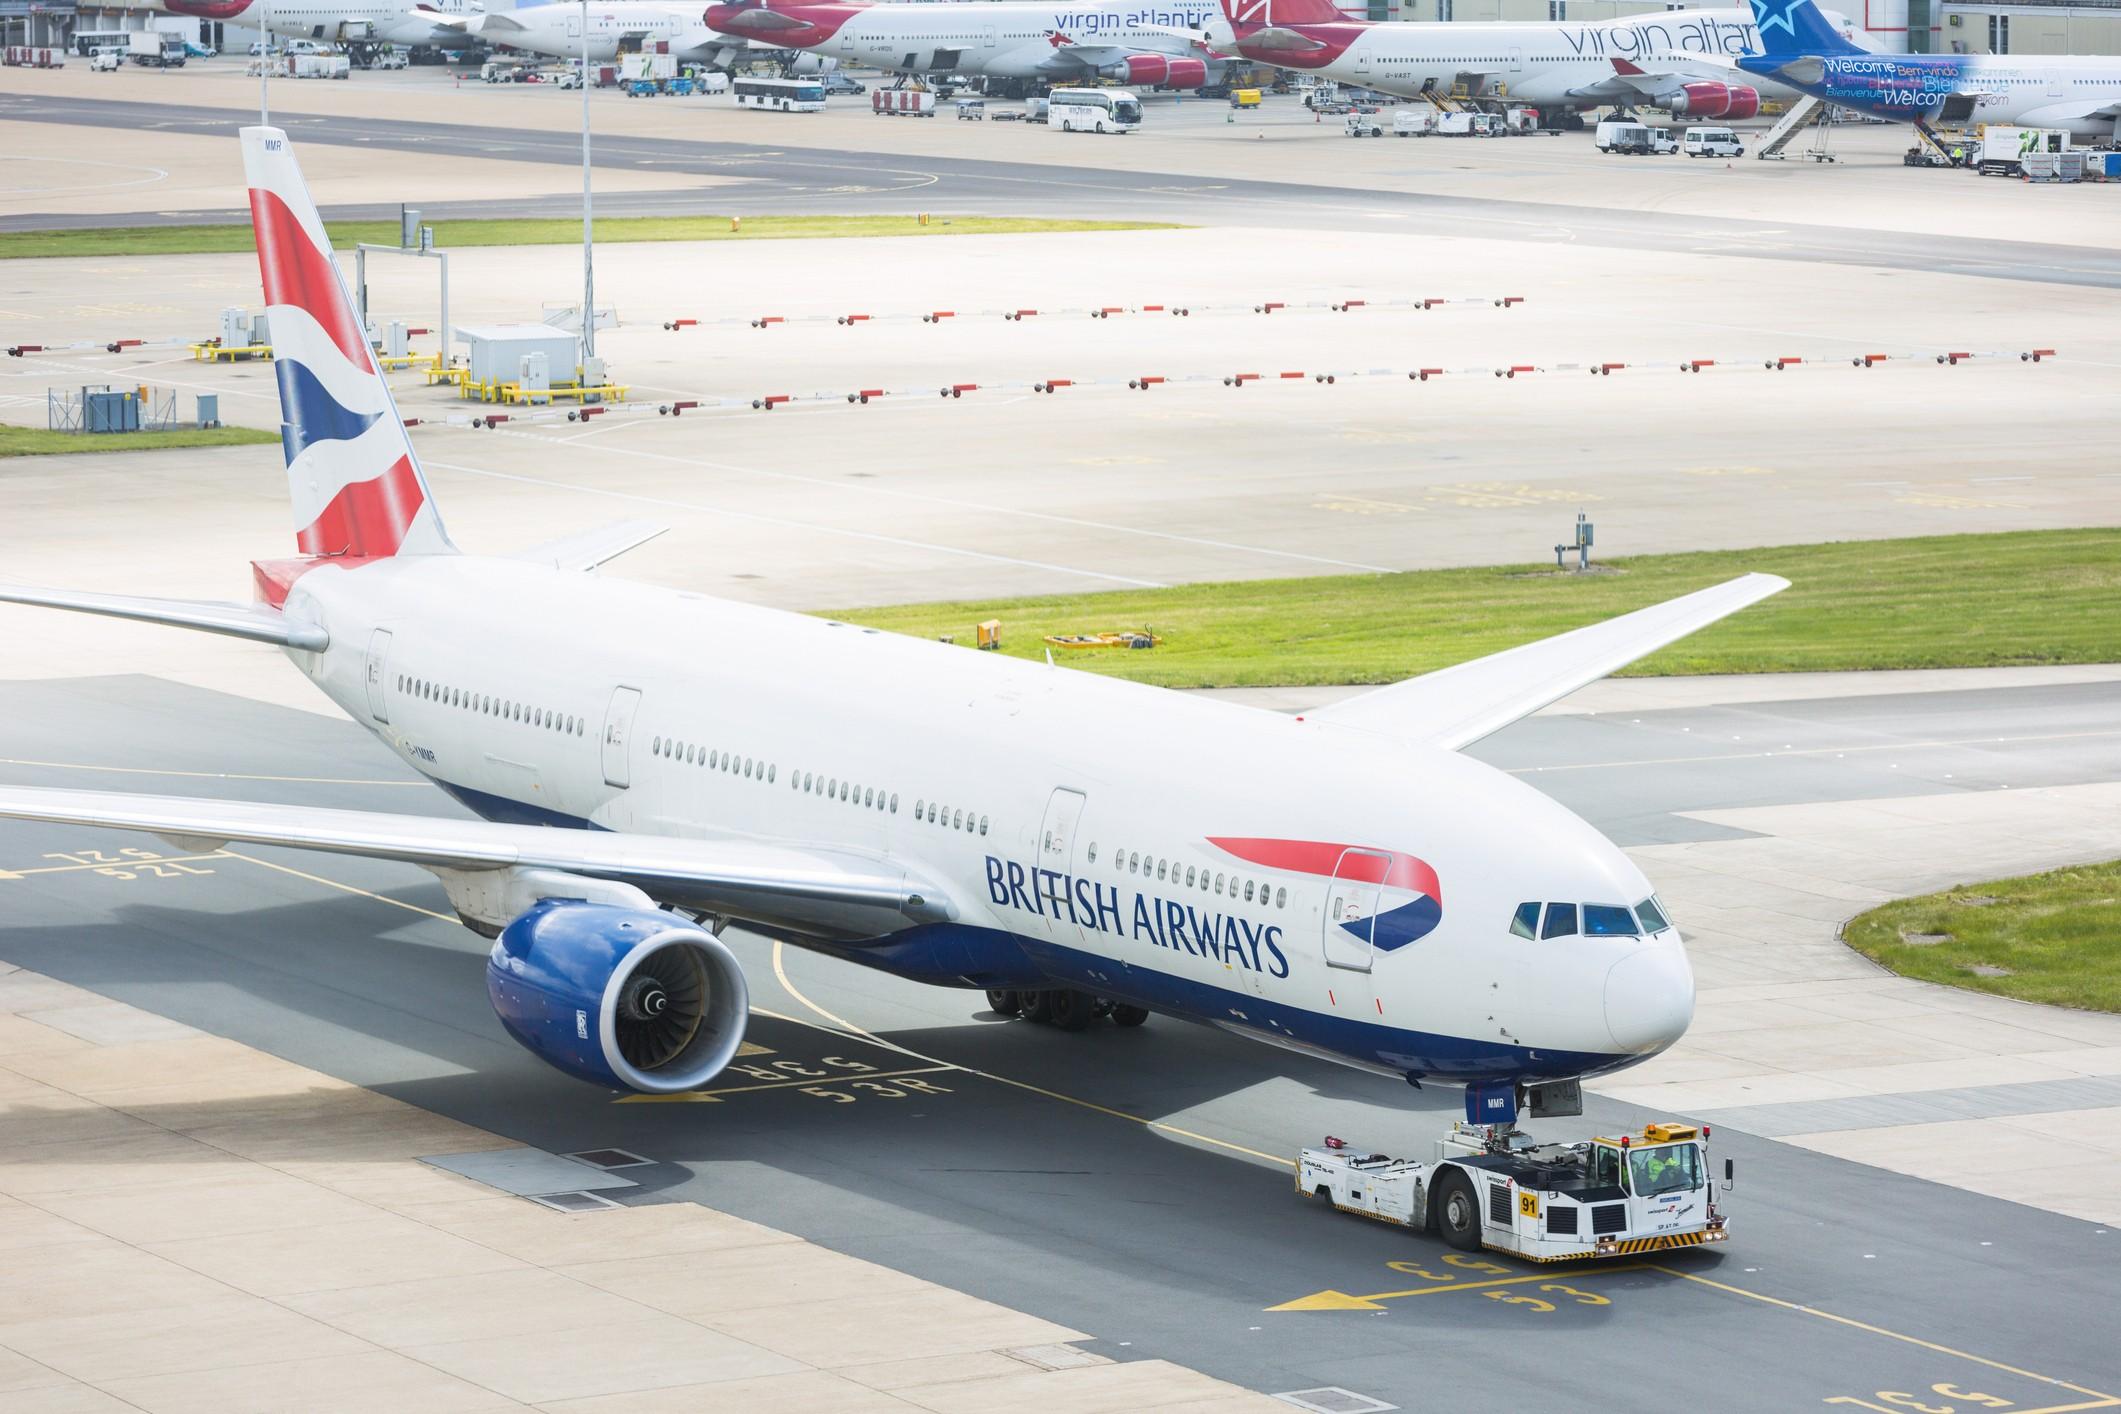 British Airways Boeing 777 at London Gatwick airport